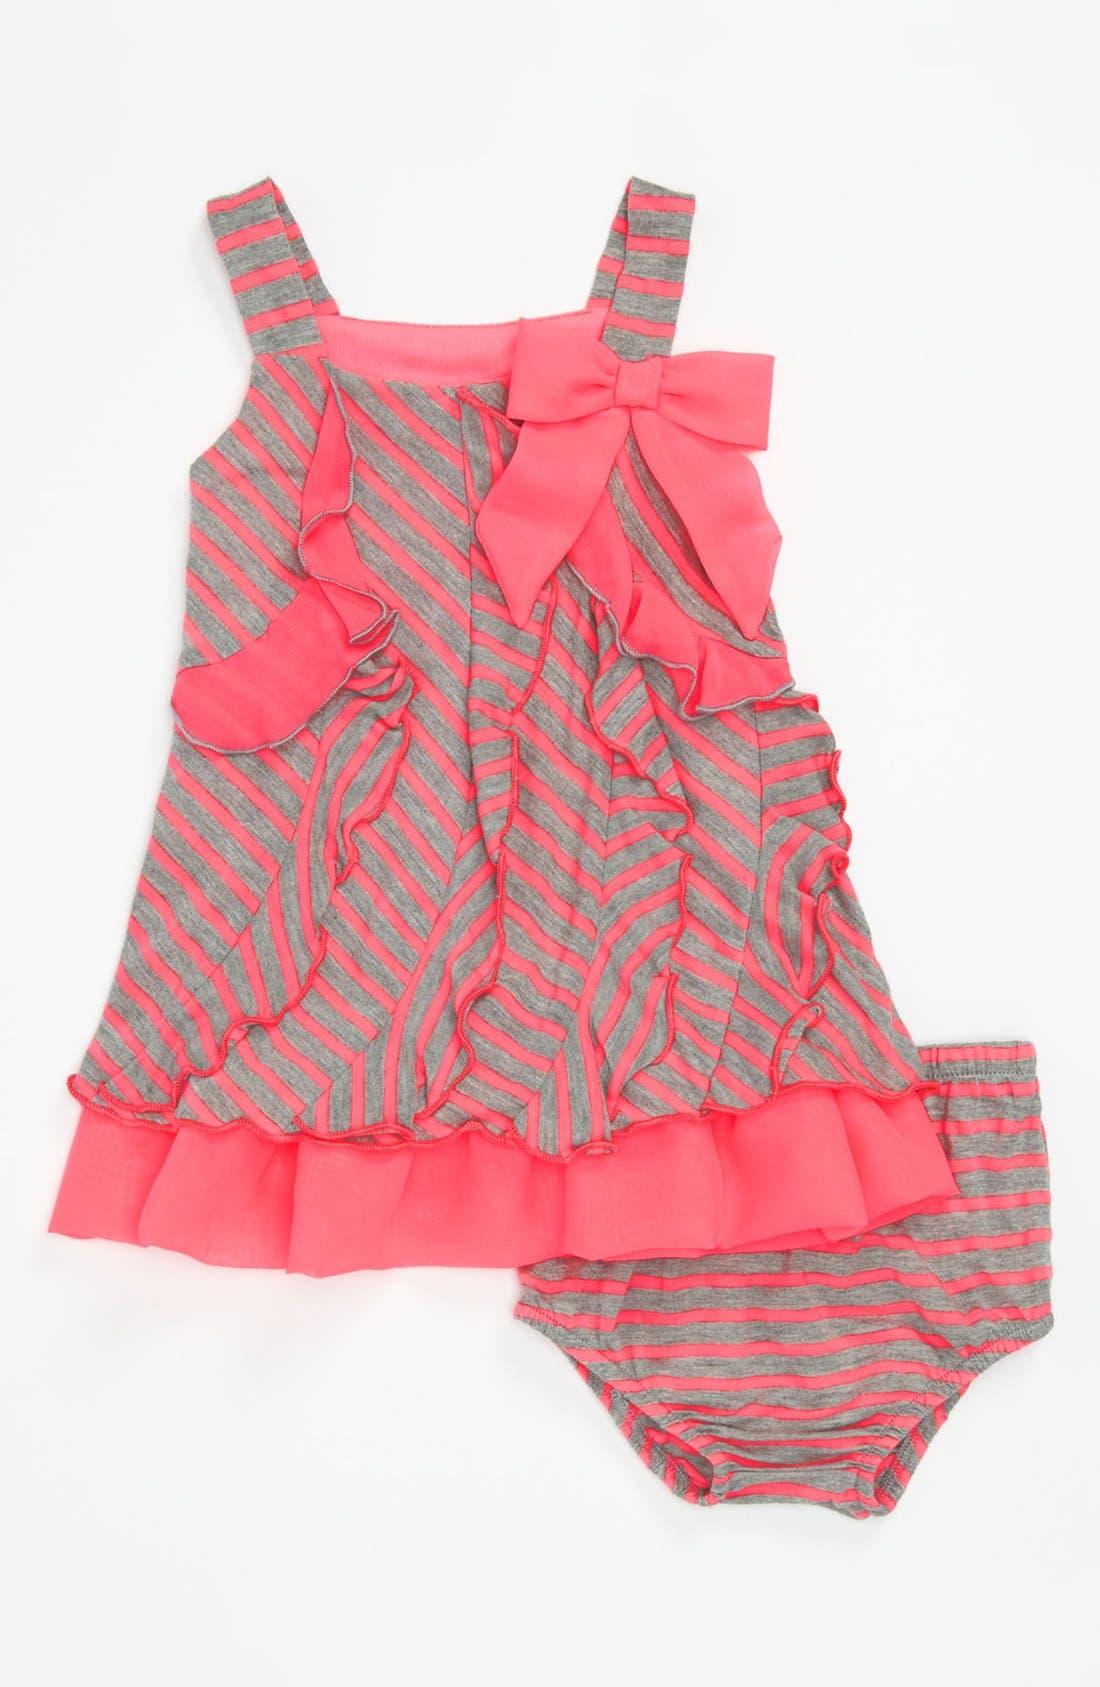 Alternate Image 1 Selected - Iris & Ivy Neon Ruffle Dress & Bloomers (Baby)